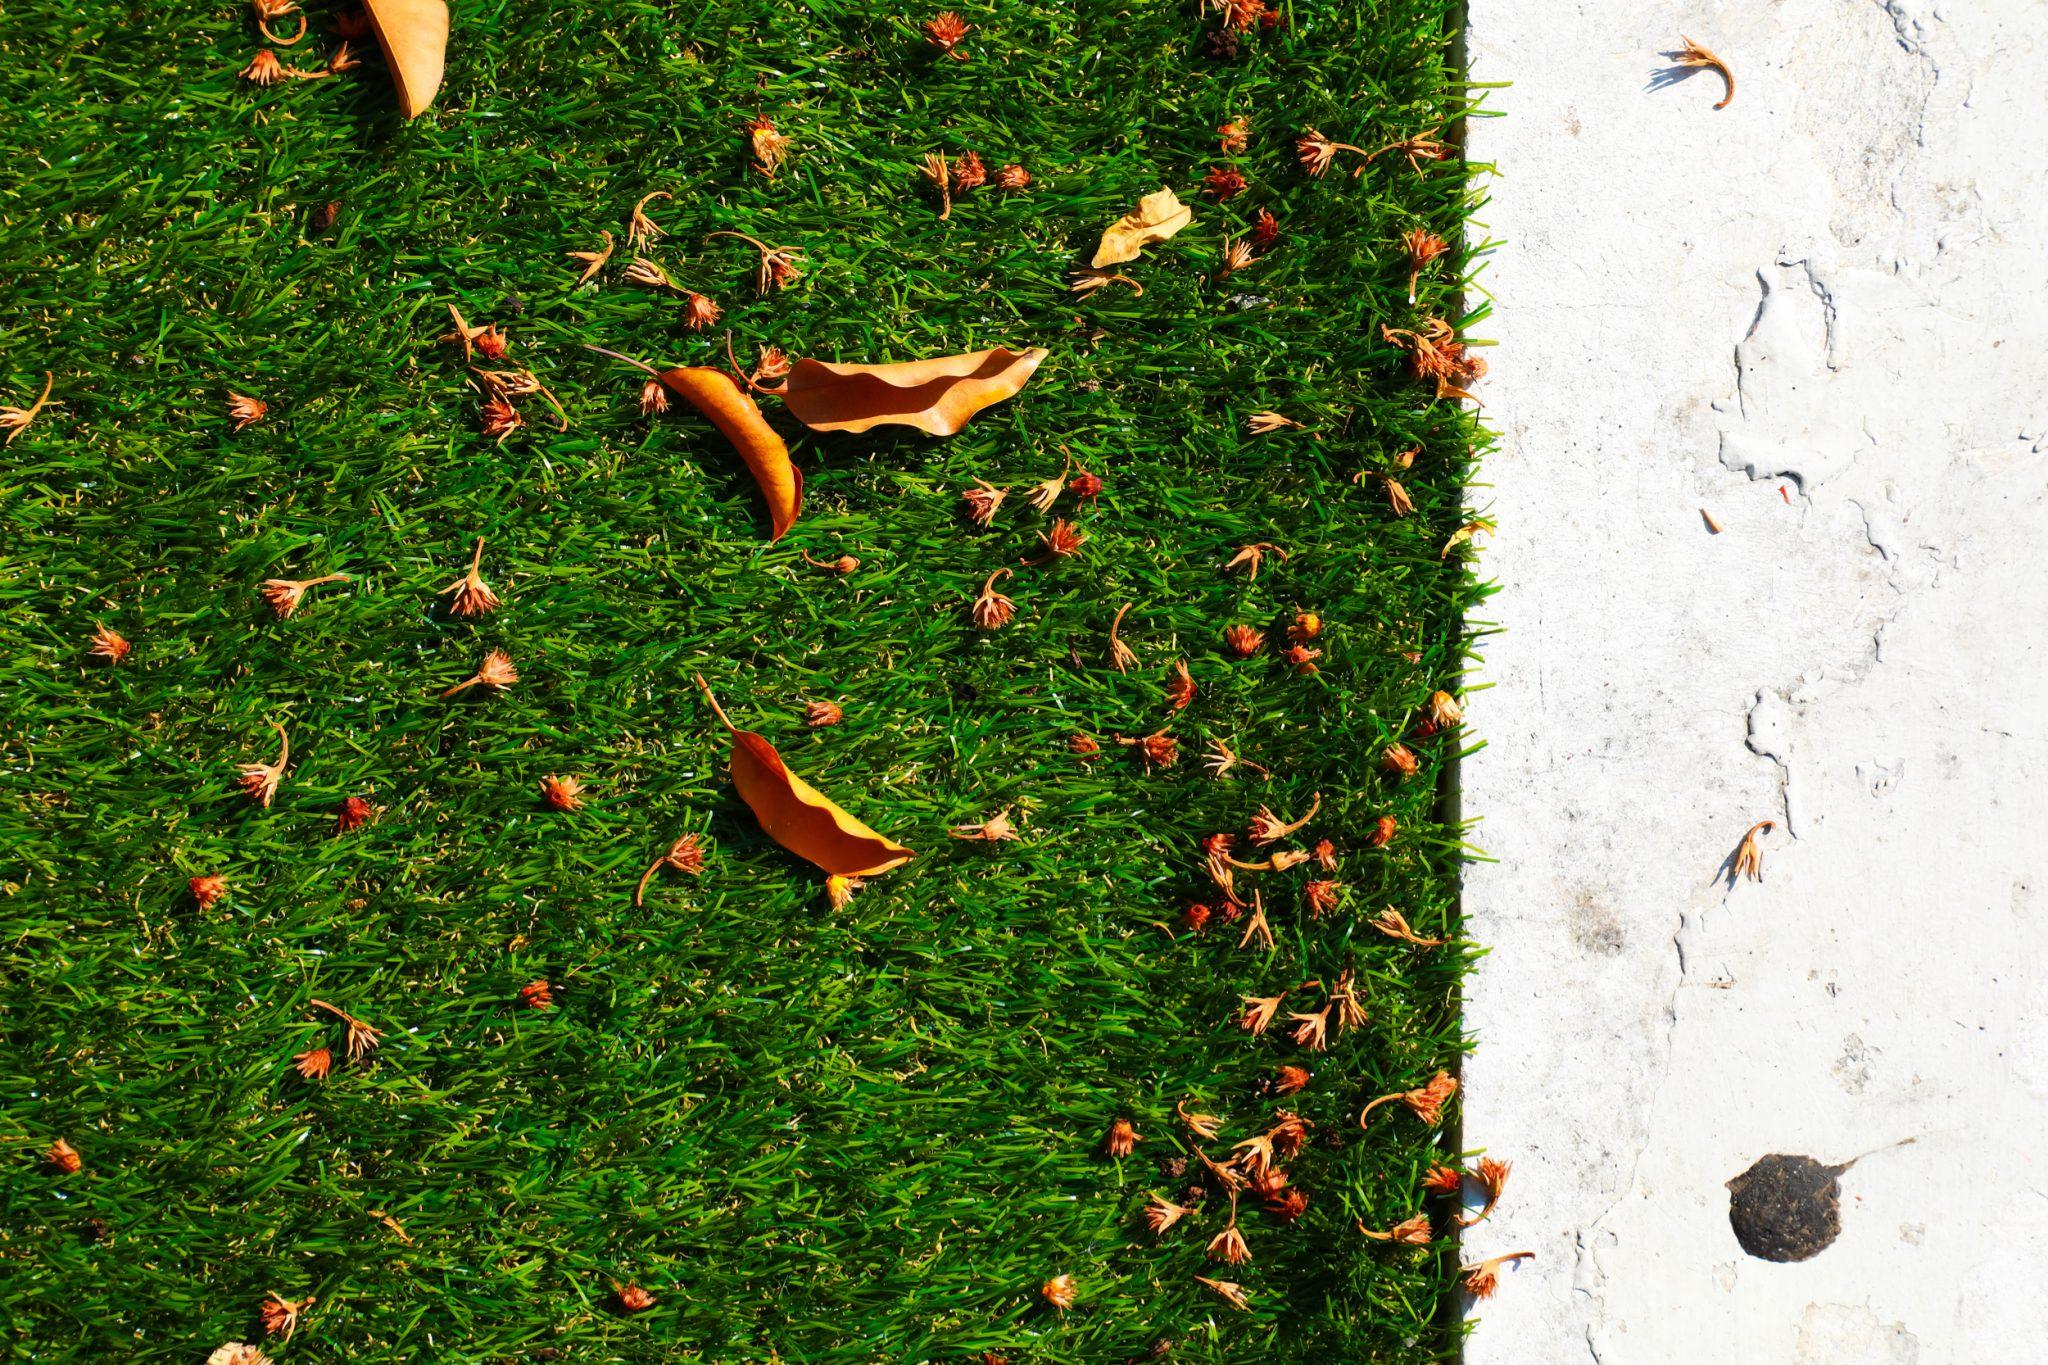 does artificial grass get muddy